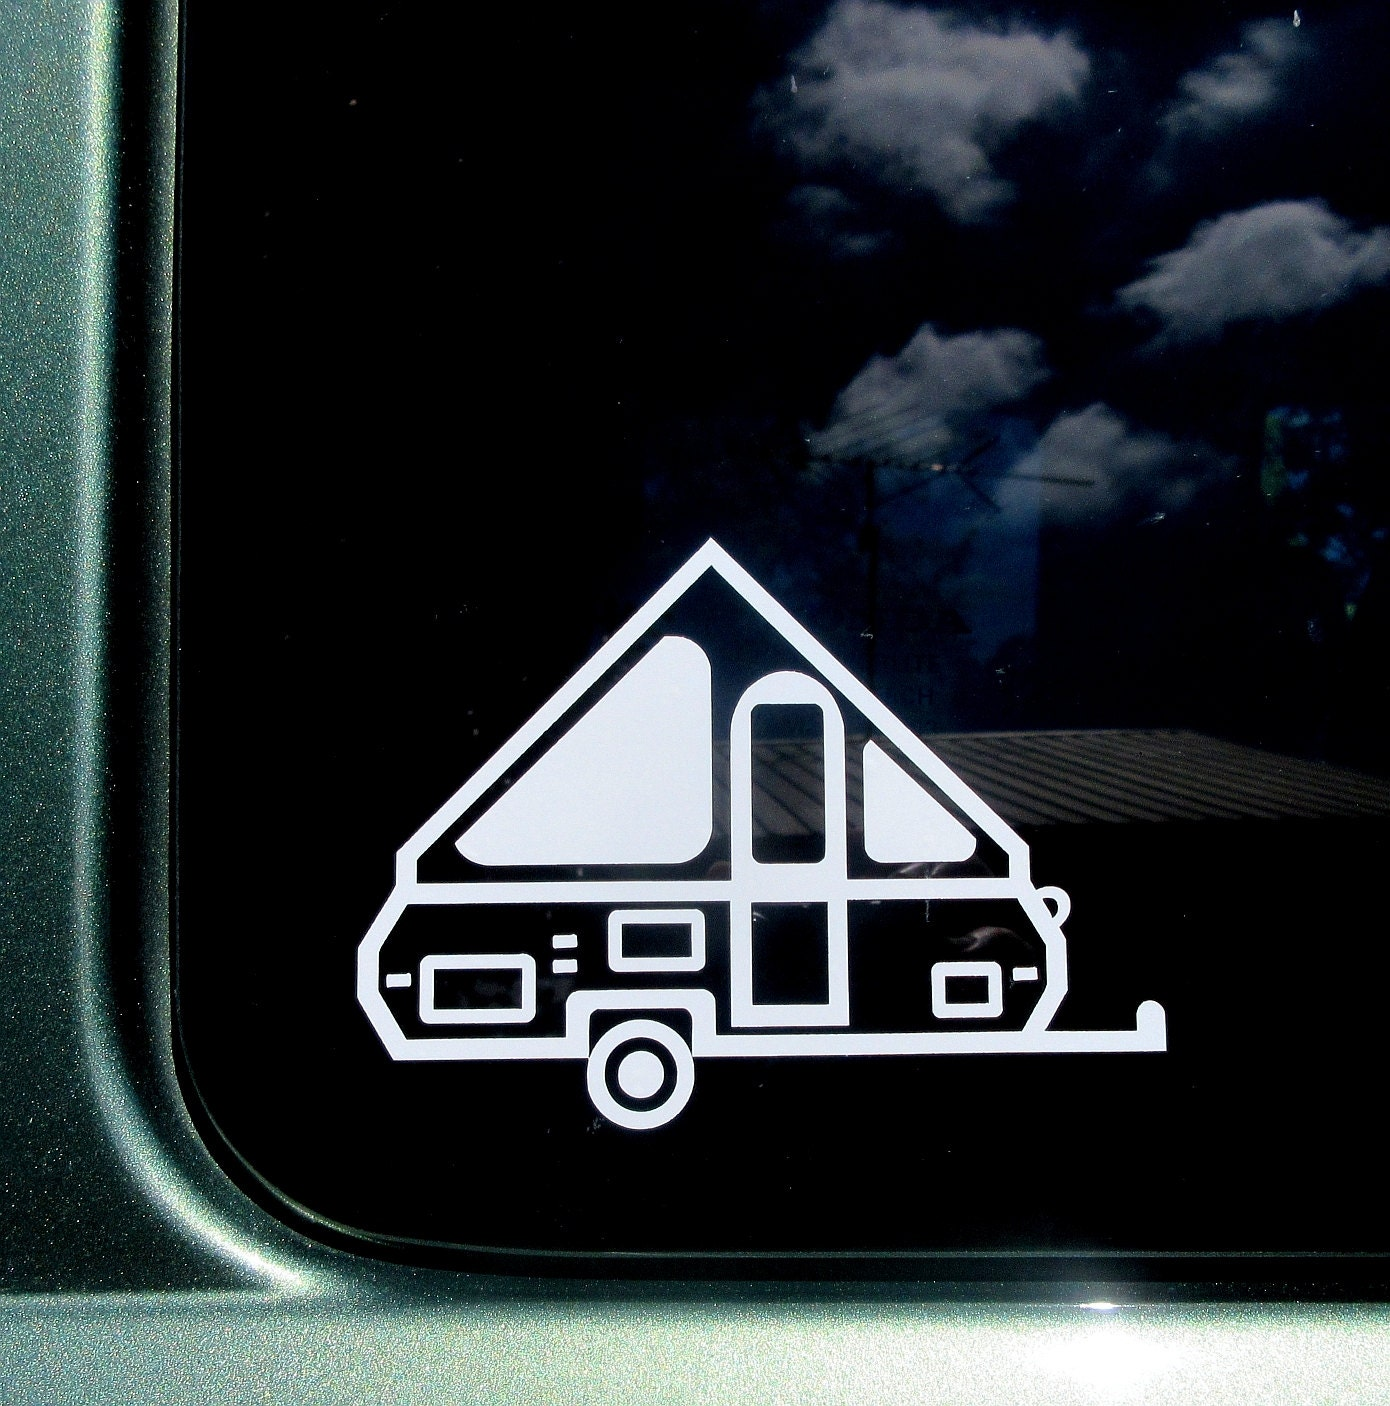 A-Frame Pop Up Camper Decal A-Frame Car Window Sticker